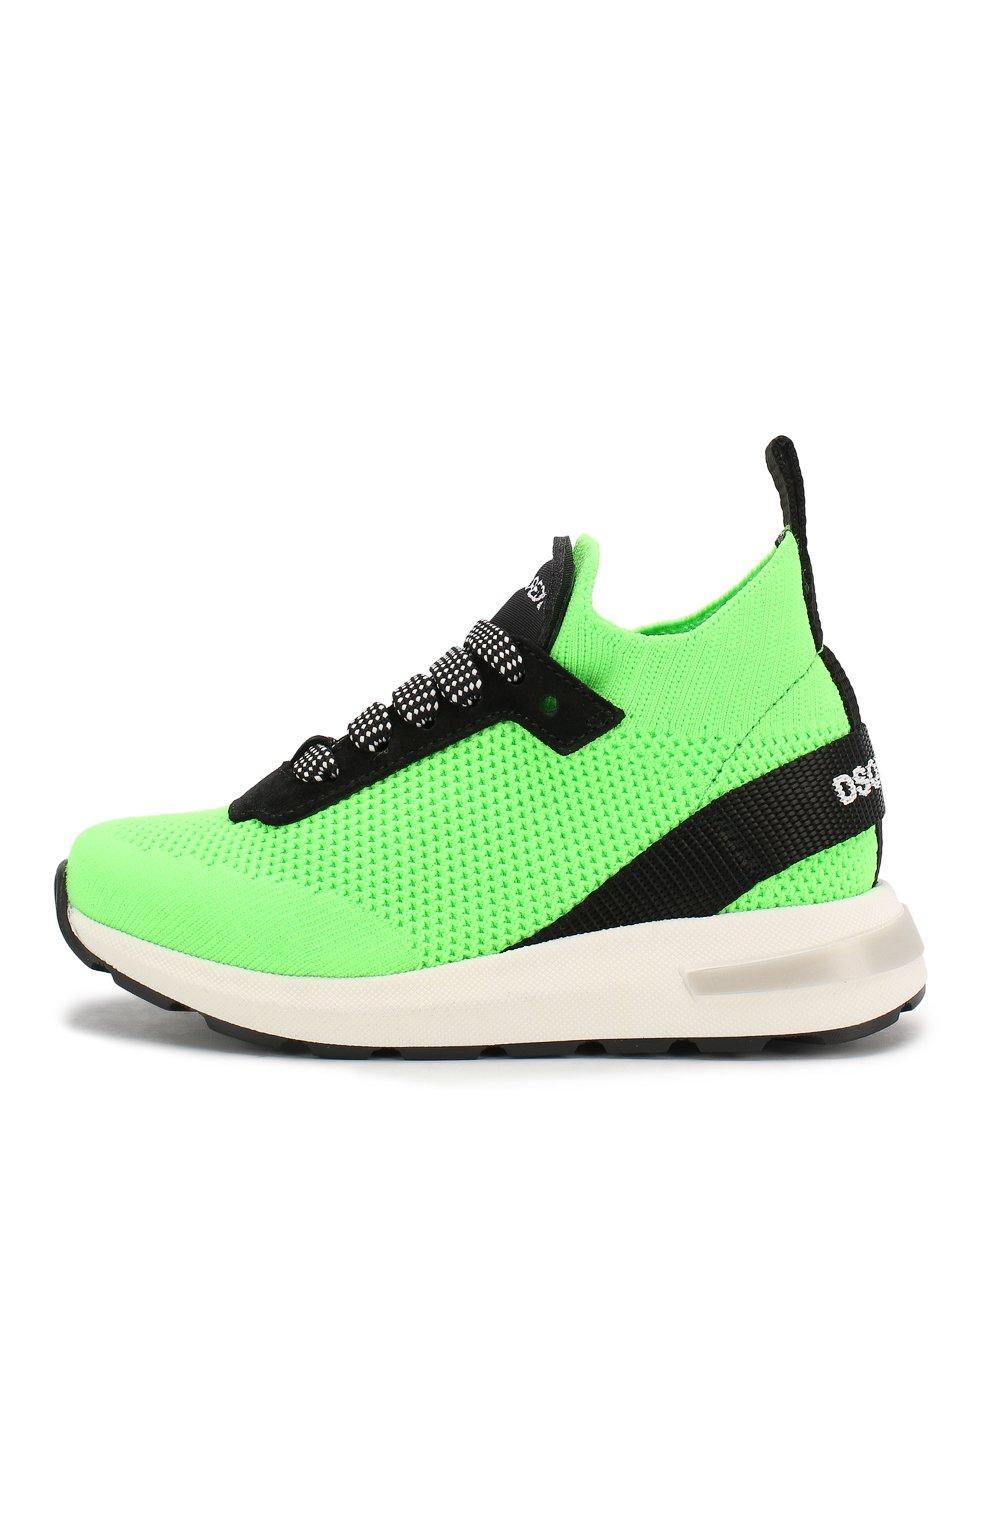 Детские кроссовки DSQUARED2 зеленого цвета, арт. 63518/18-27 | Фото 2